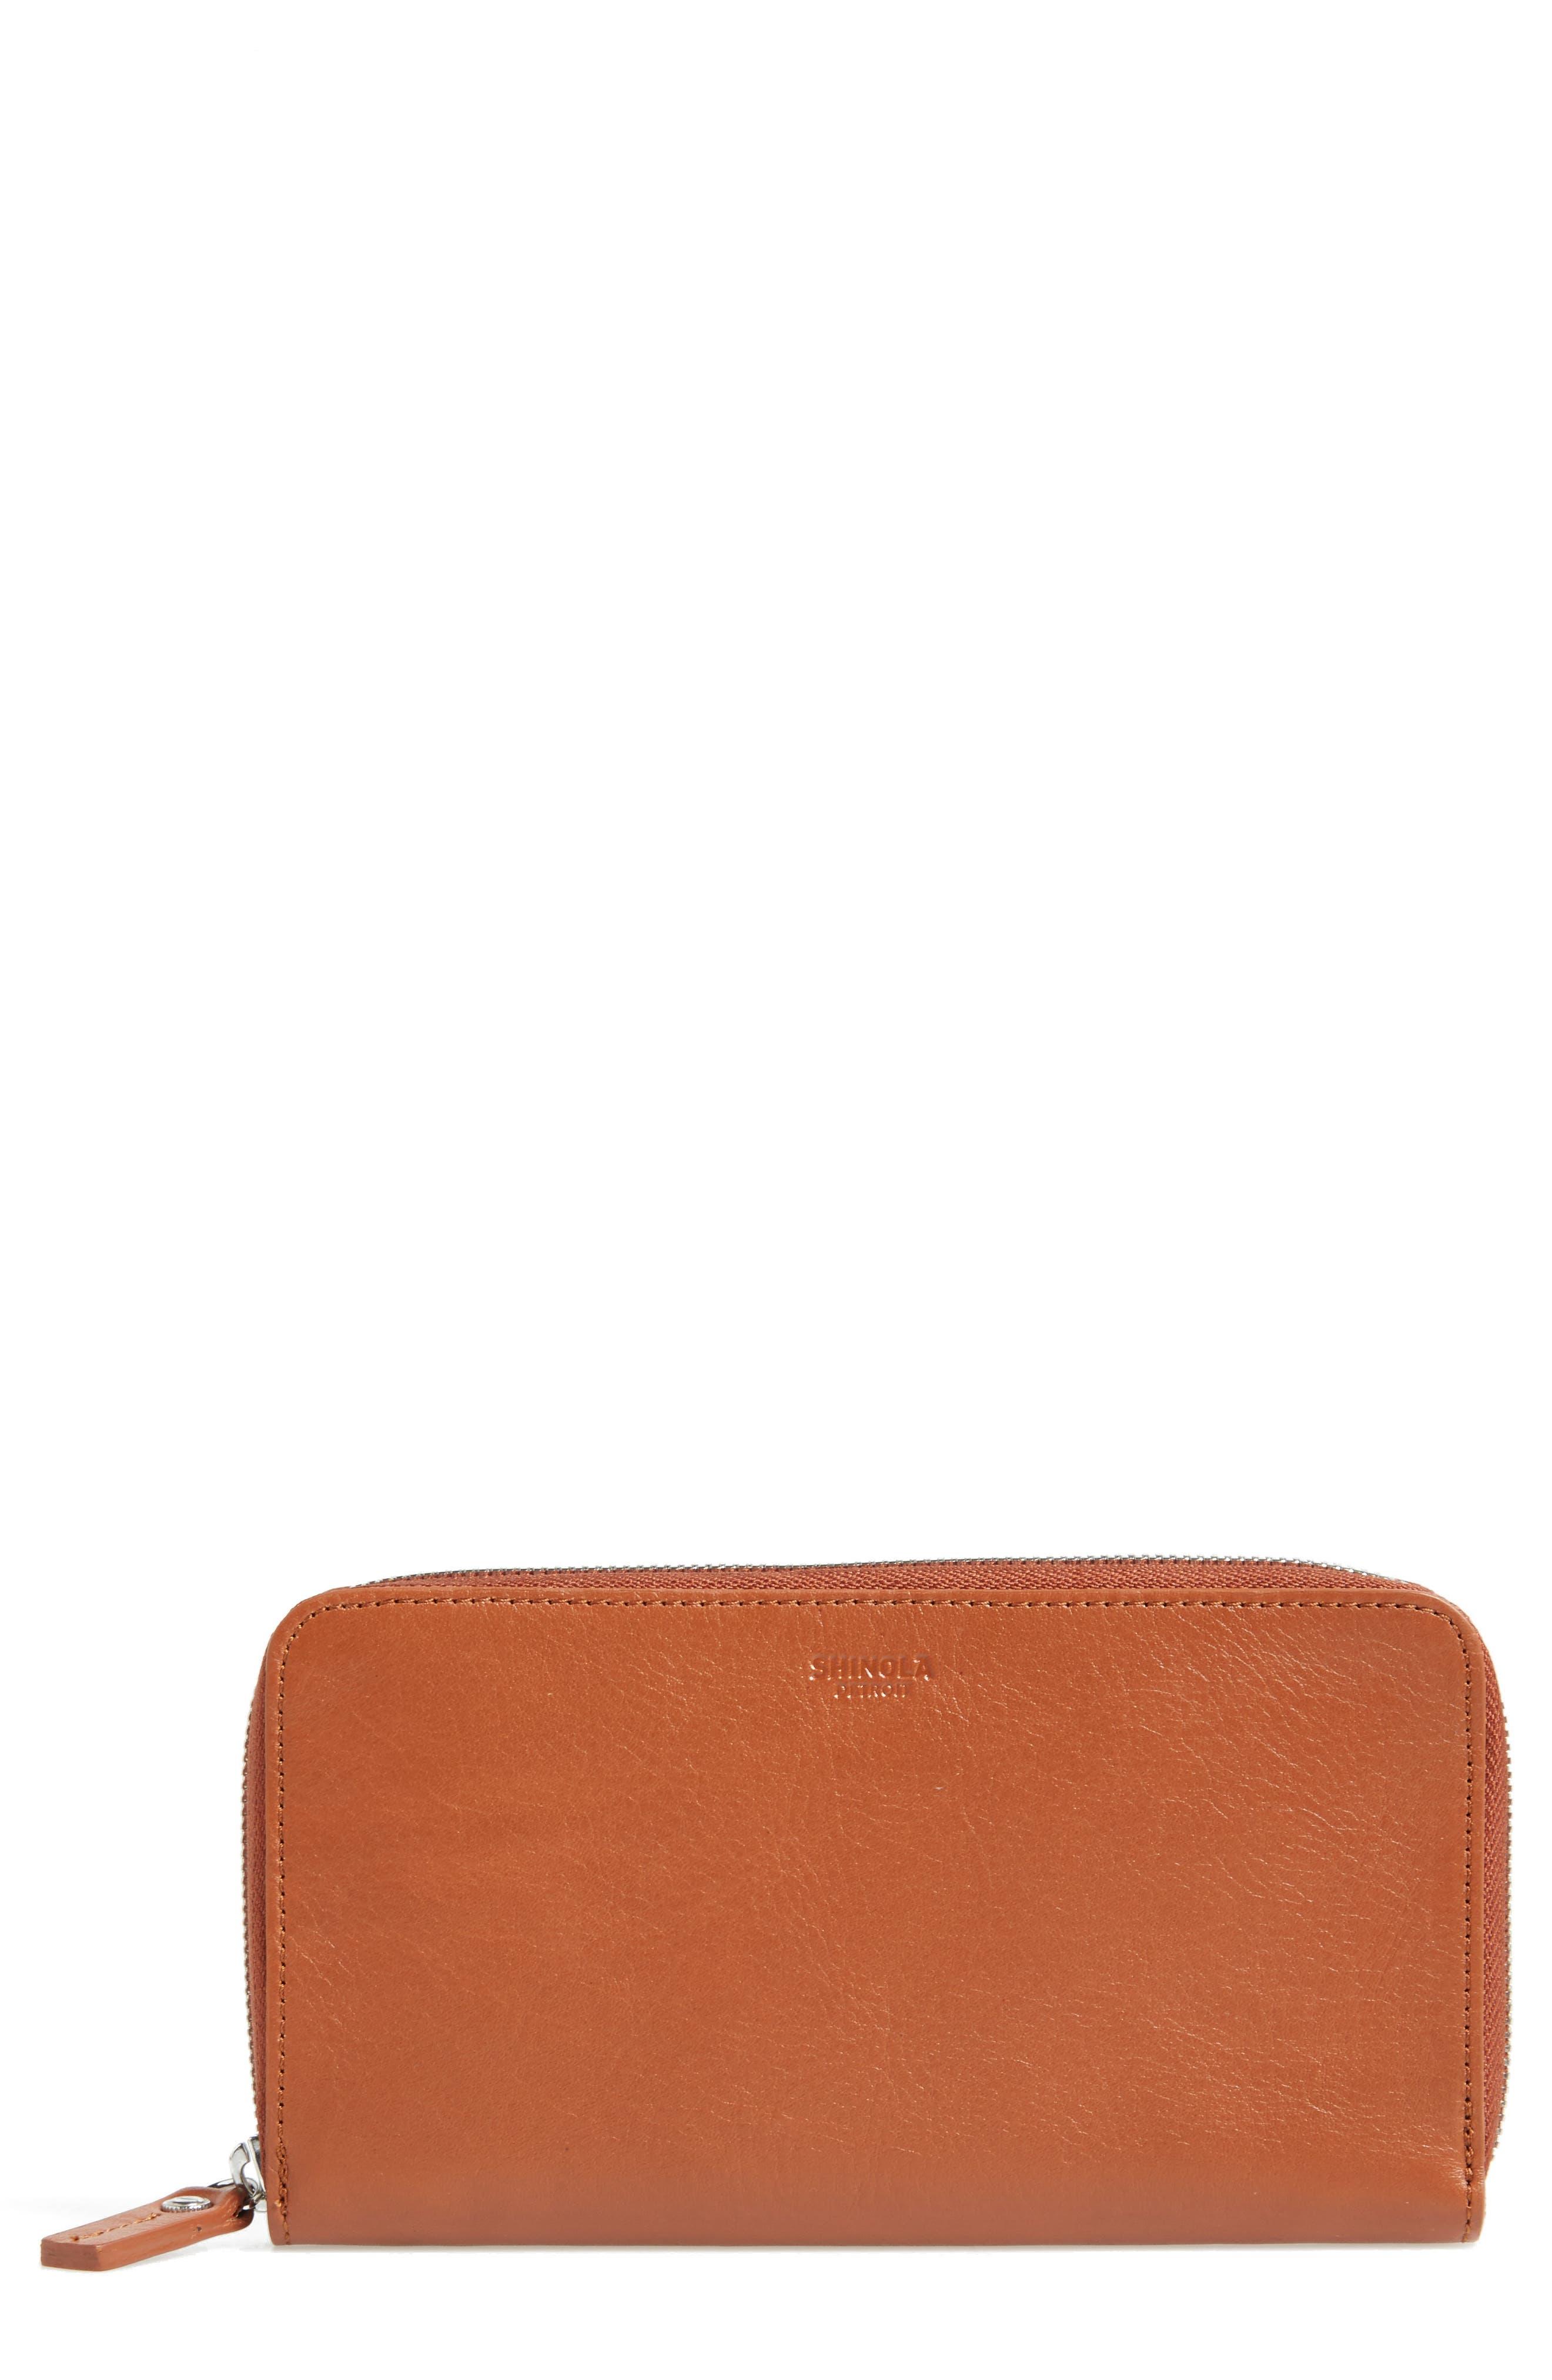 SHINOLA Signature Lea Leather Continental Wallet